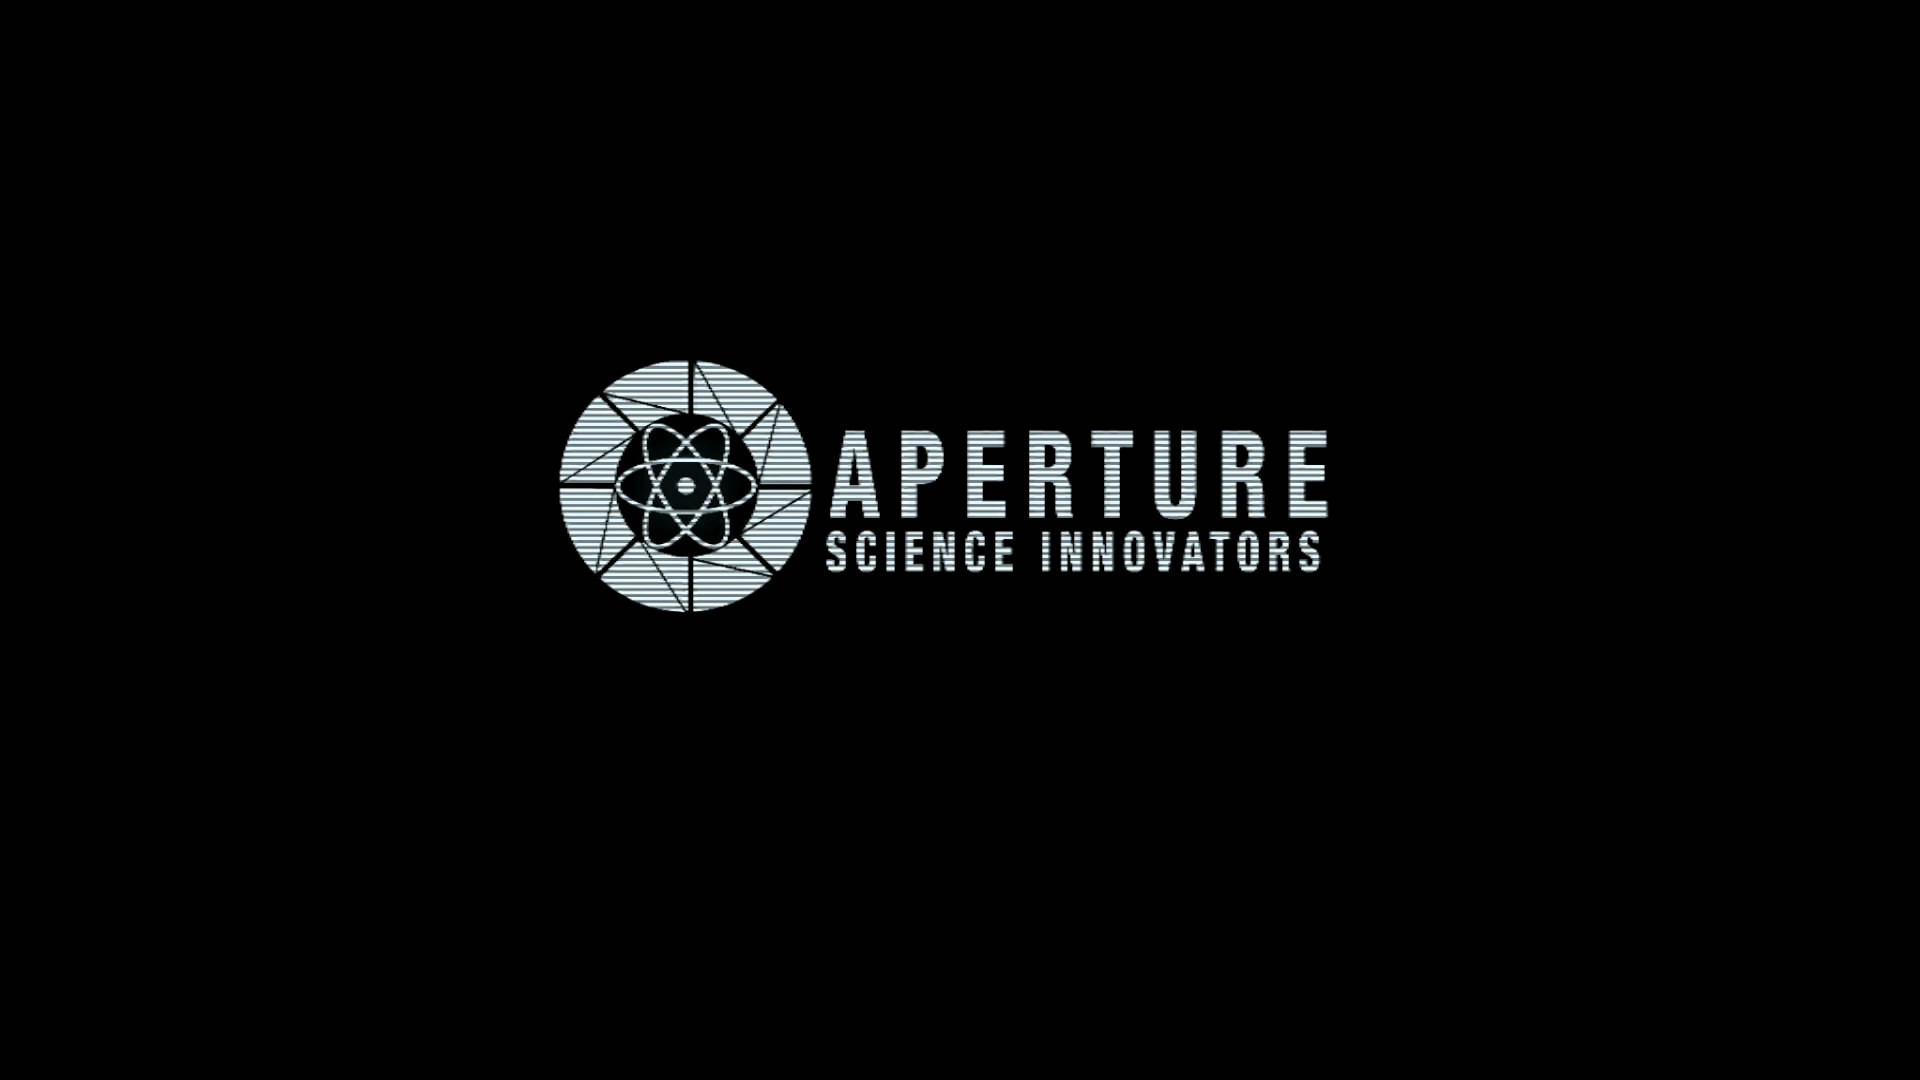 Portal Aperture Laboratories Portal 2 wallpaper | | 223336 |  WallpaperUP